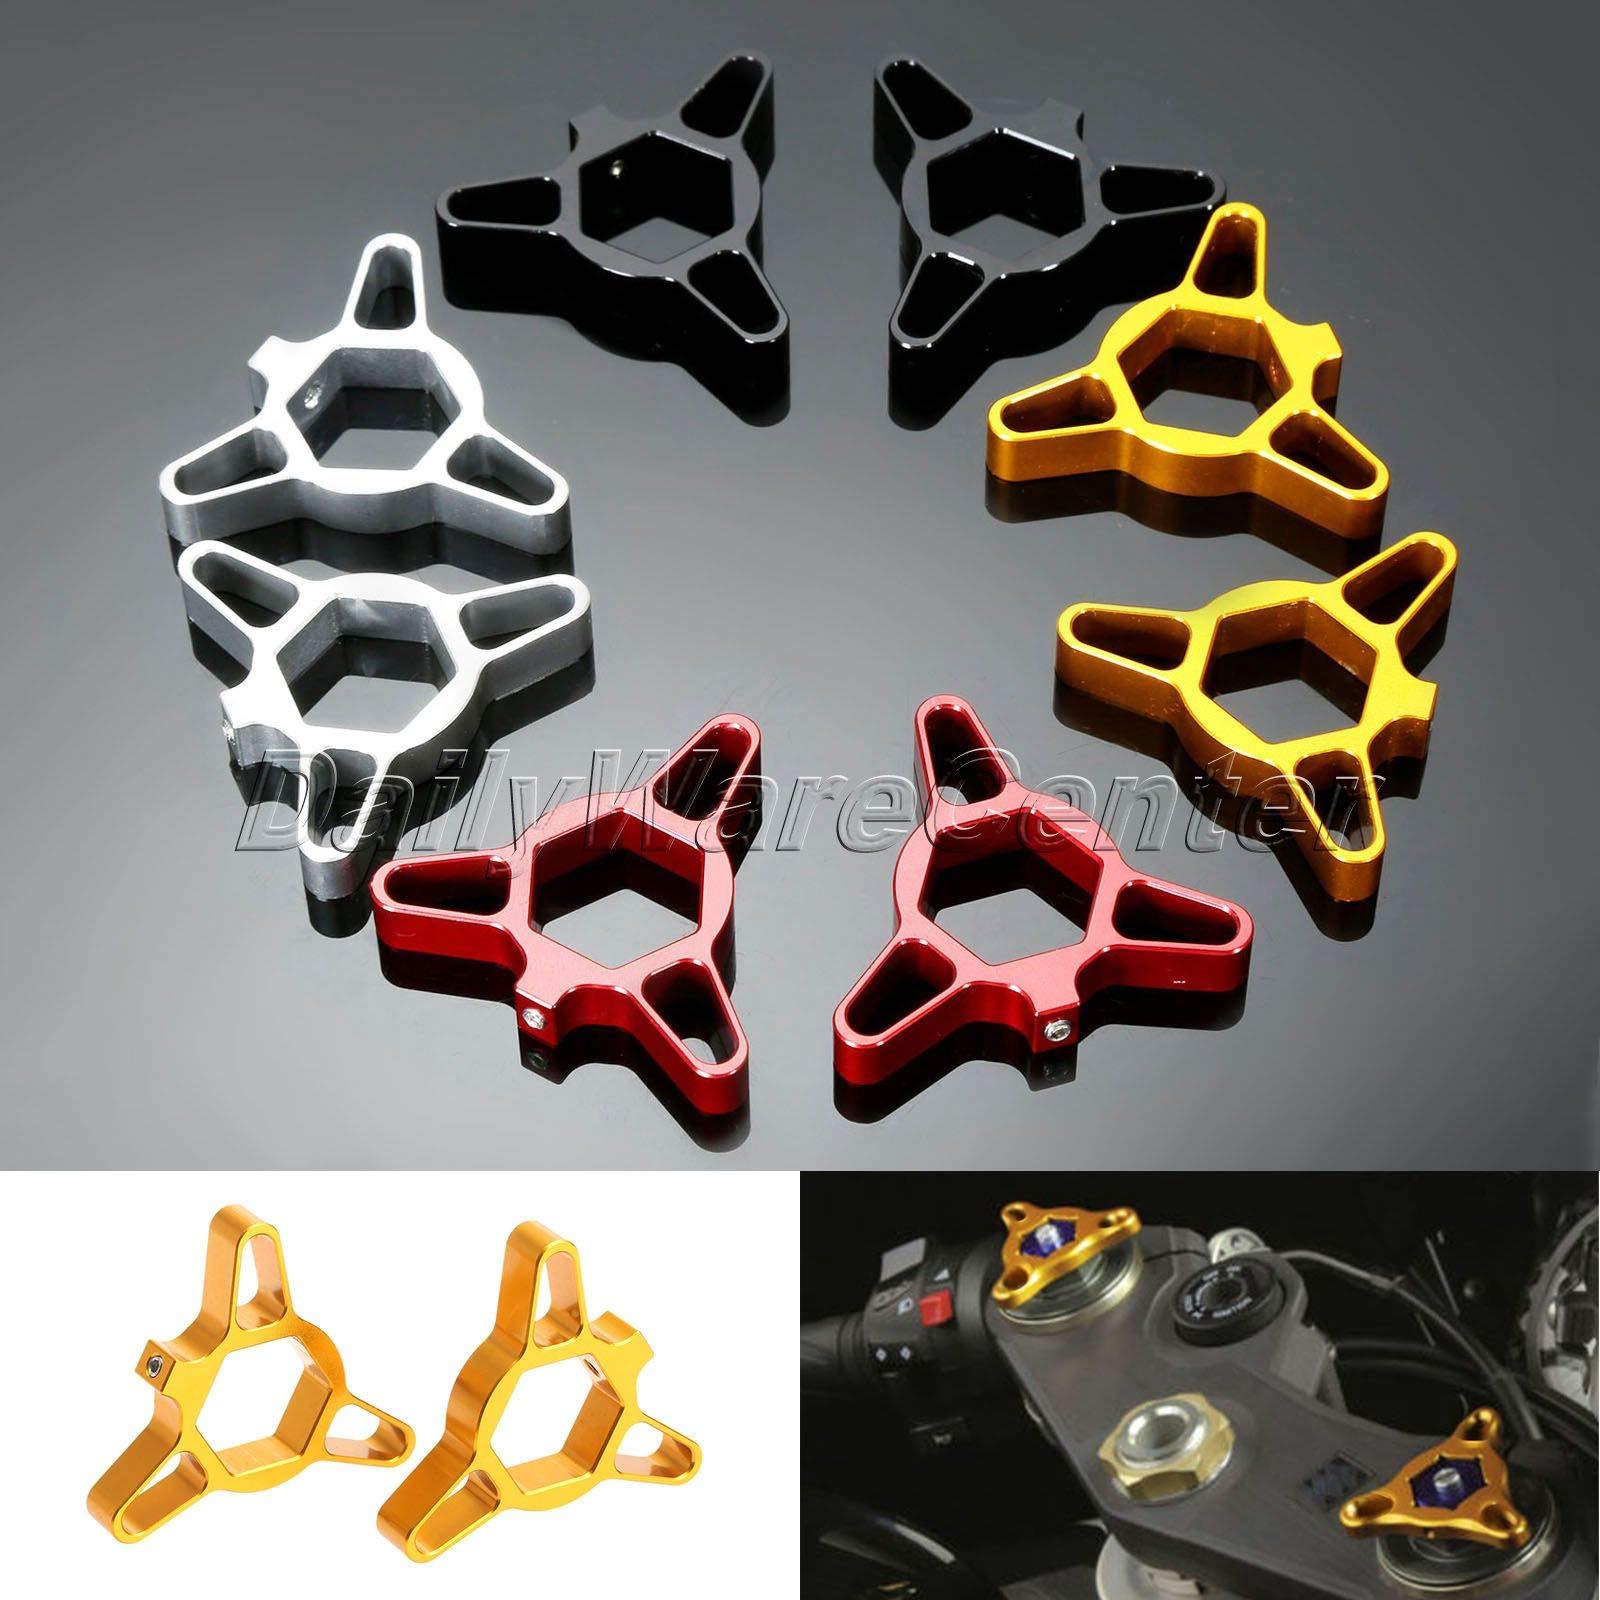 Daphot-Store - 2x Universal 17mm CNC Aluminum Motorcycle Fork Preload Adjuster For BMW Honda CBR125 Ducati YAMAHA YZF R6 Suzuki TL1000S TL1000R